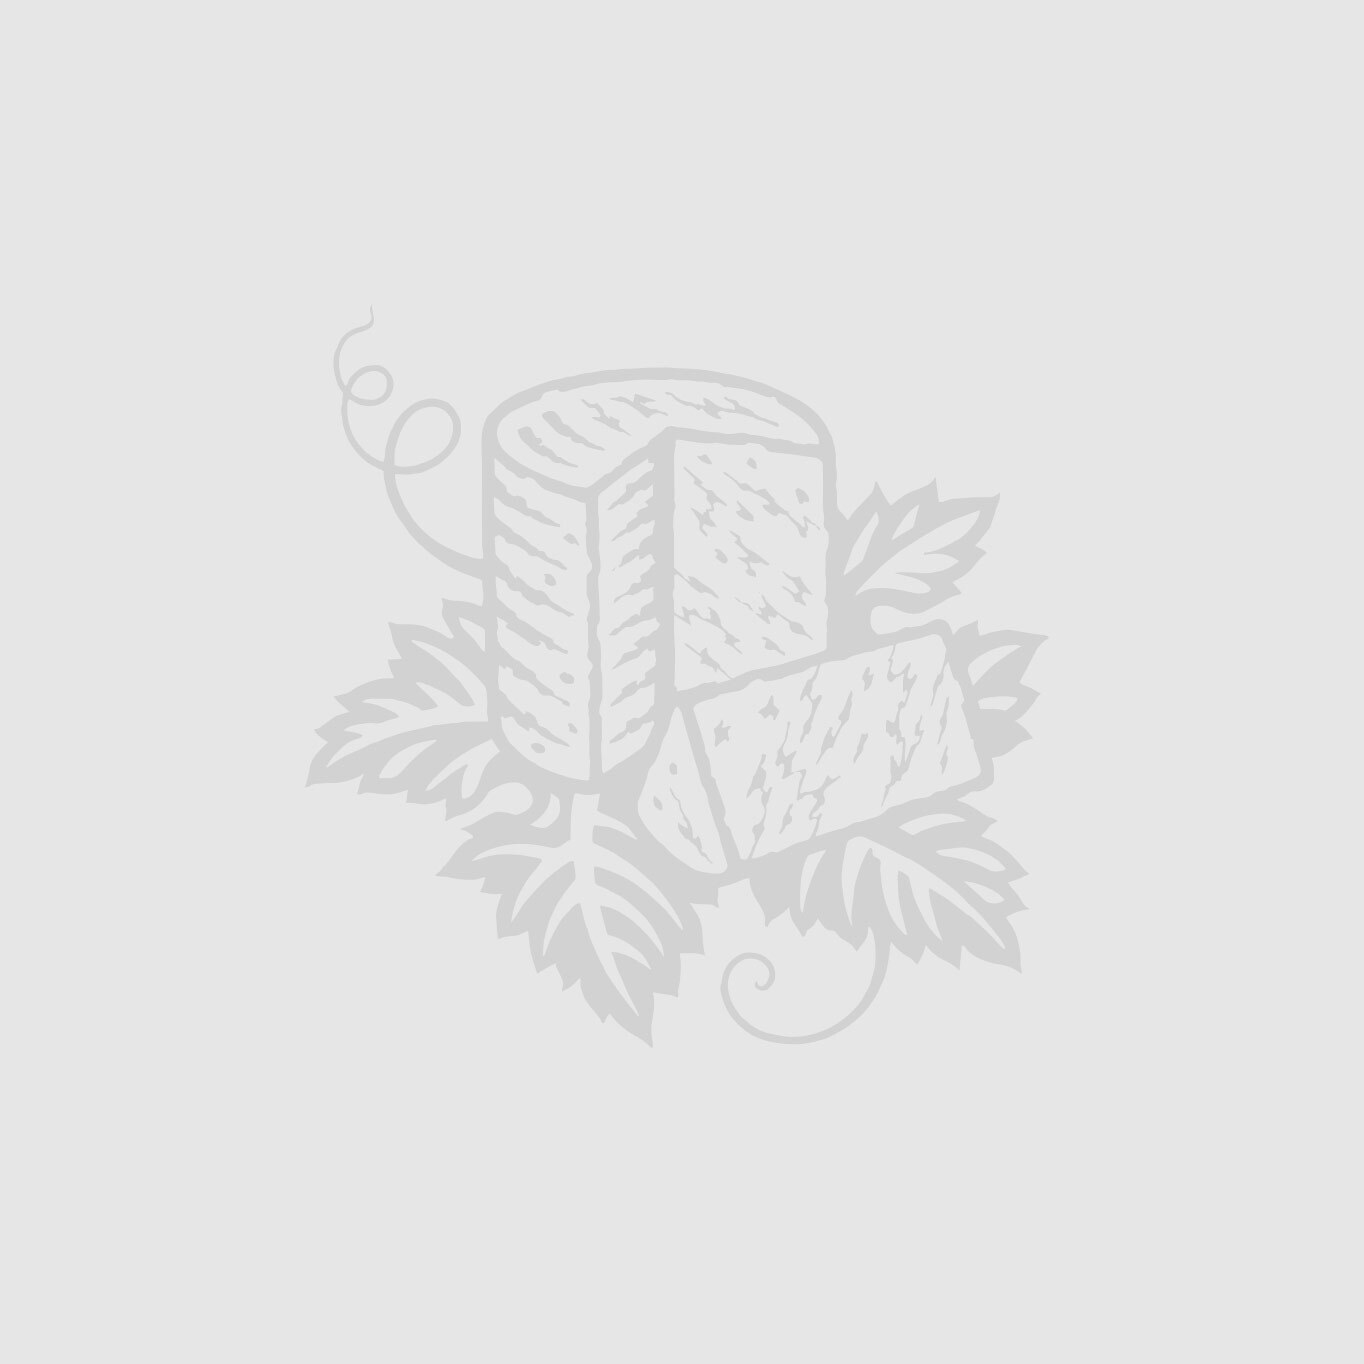 Mira La Mar Fino Sherry Covi Jerez